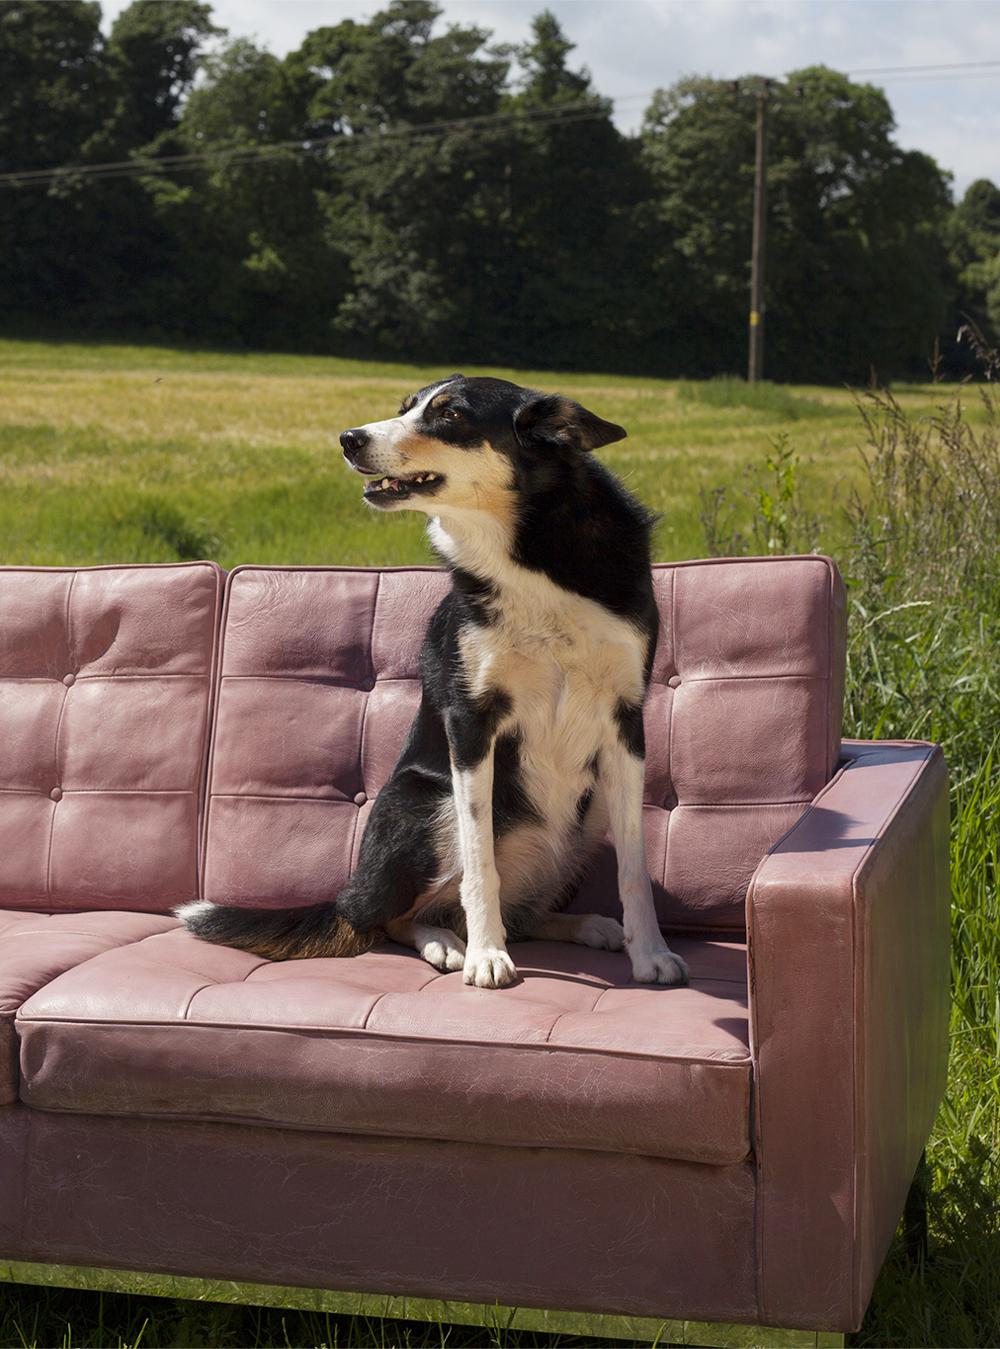 katie_on_sofa